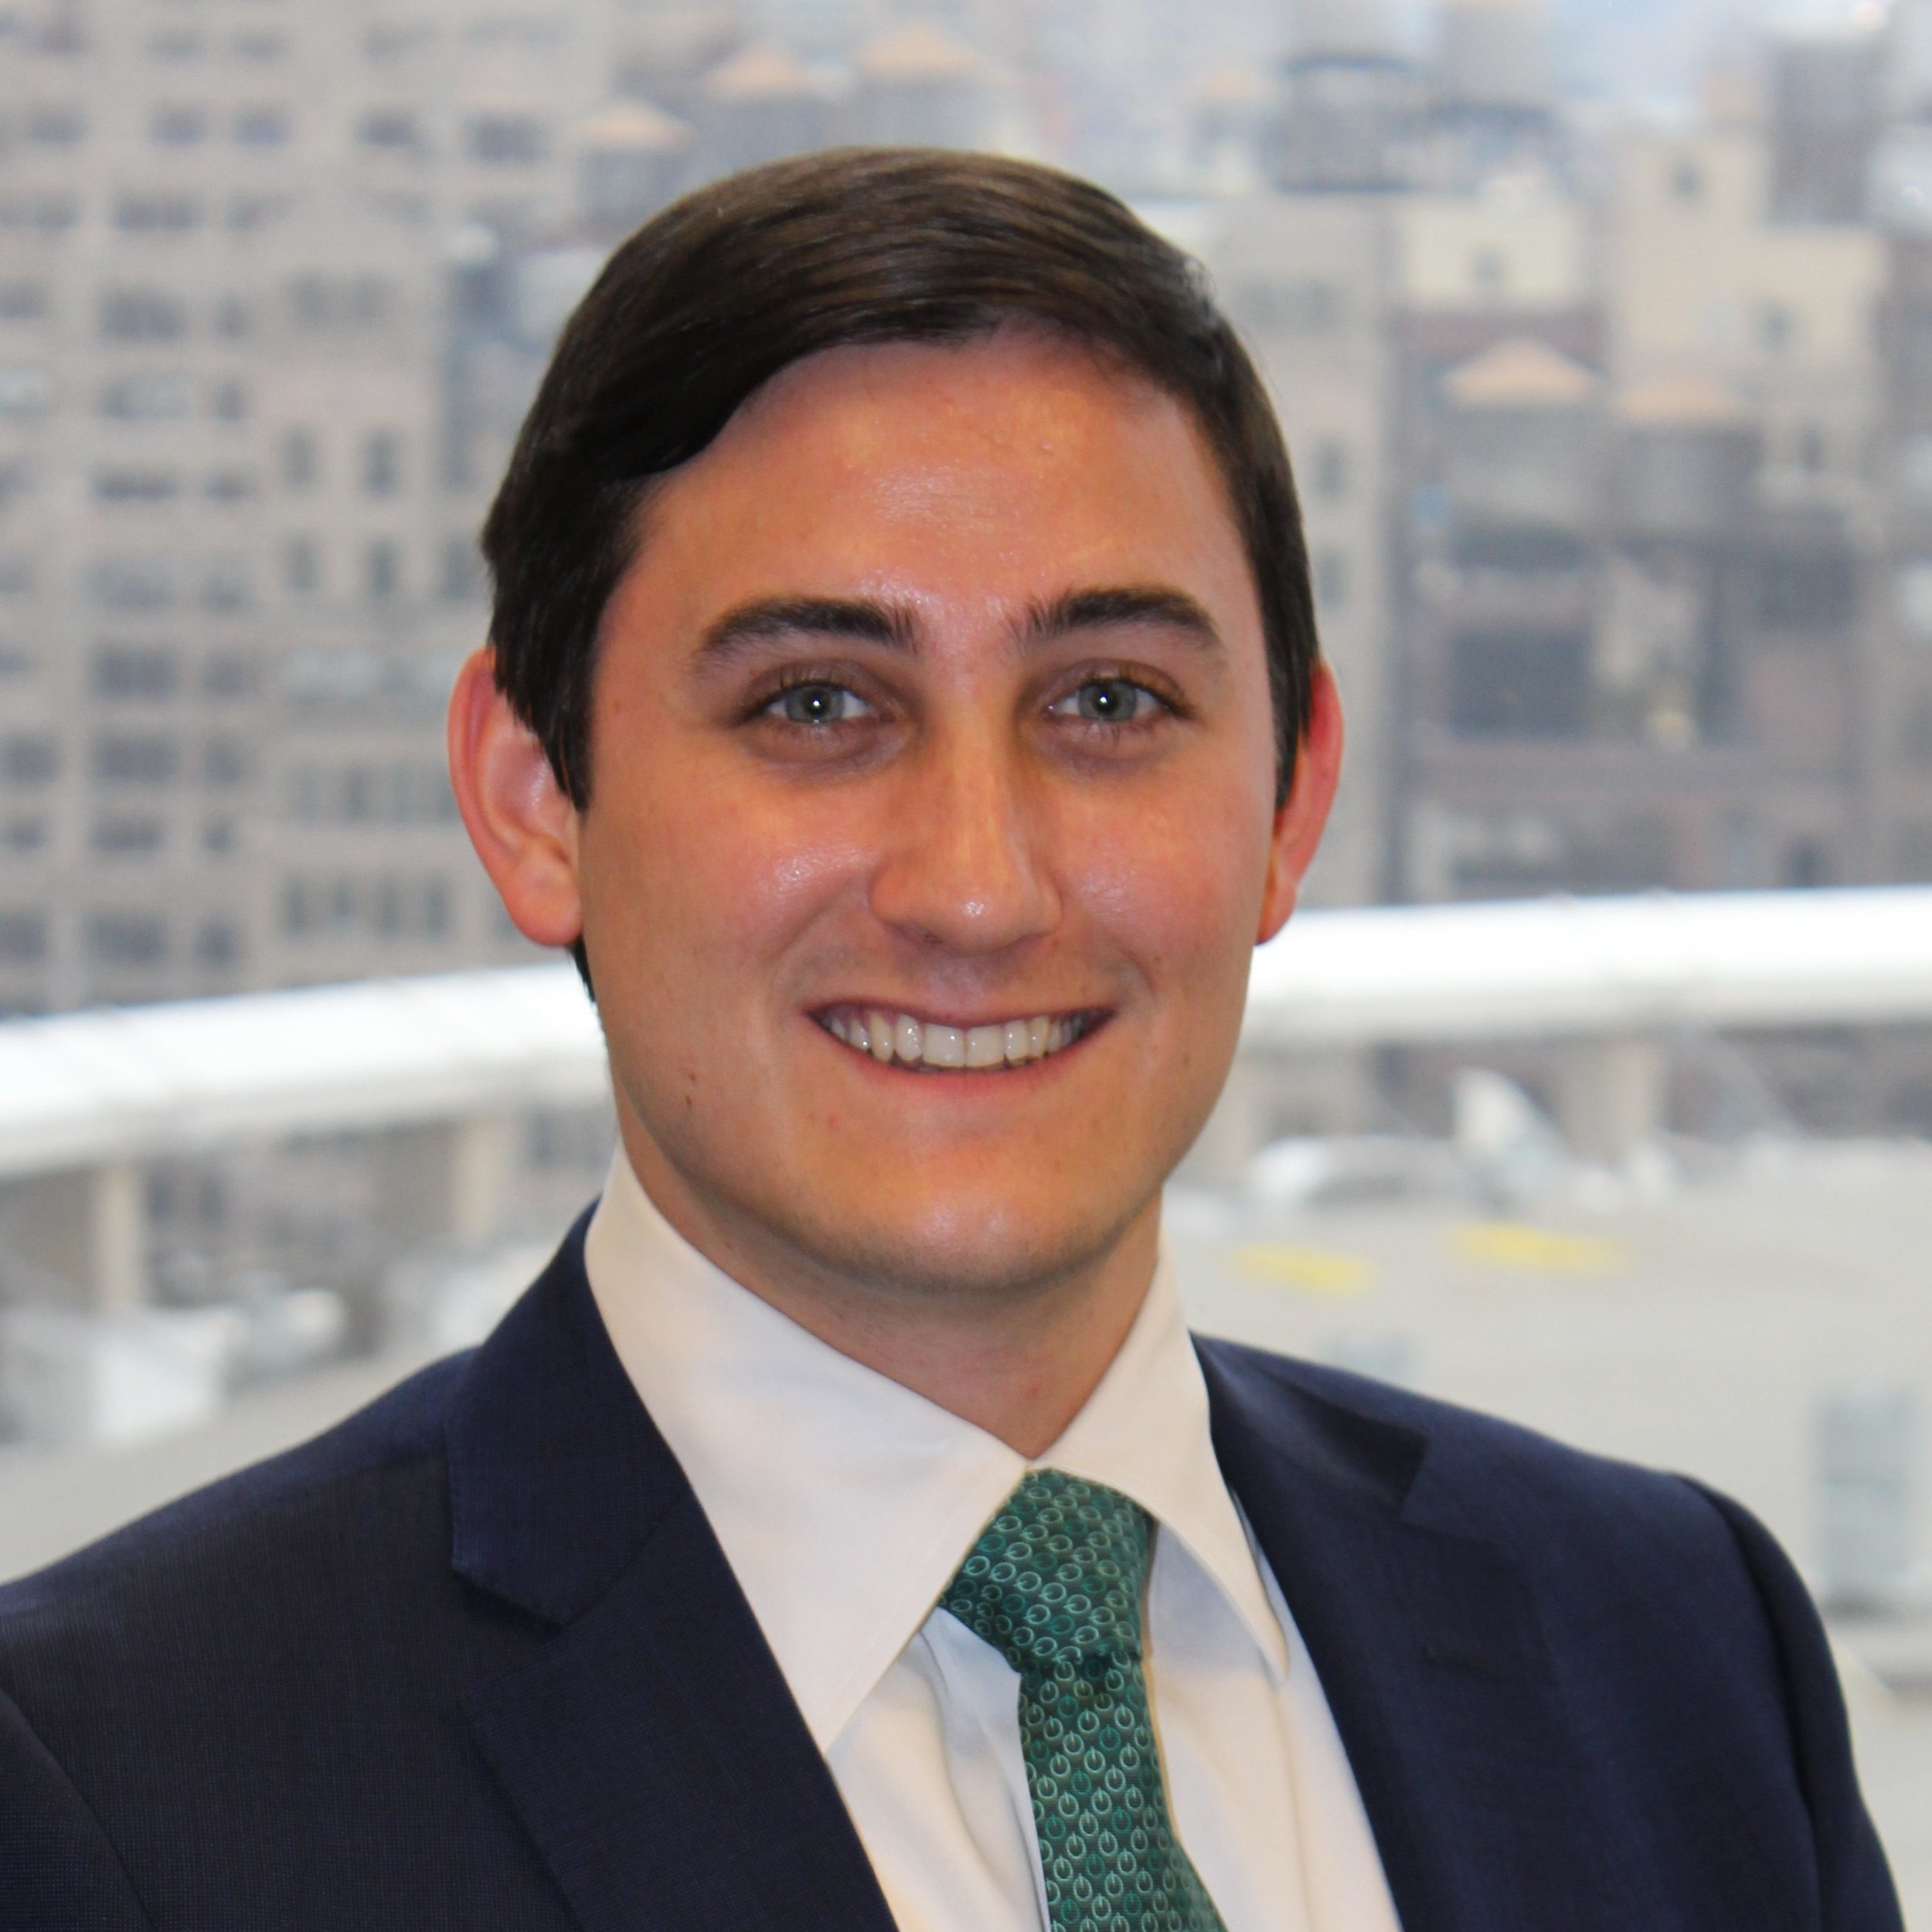 Thomas Wopat-Moreau - Portfolio Manager, U.S. EquitiesFOURPOINTS Asset Management (New York)